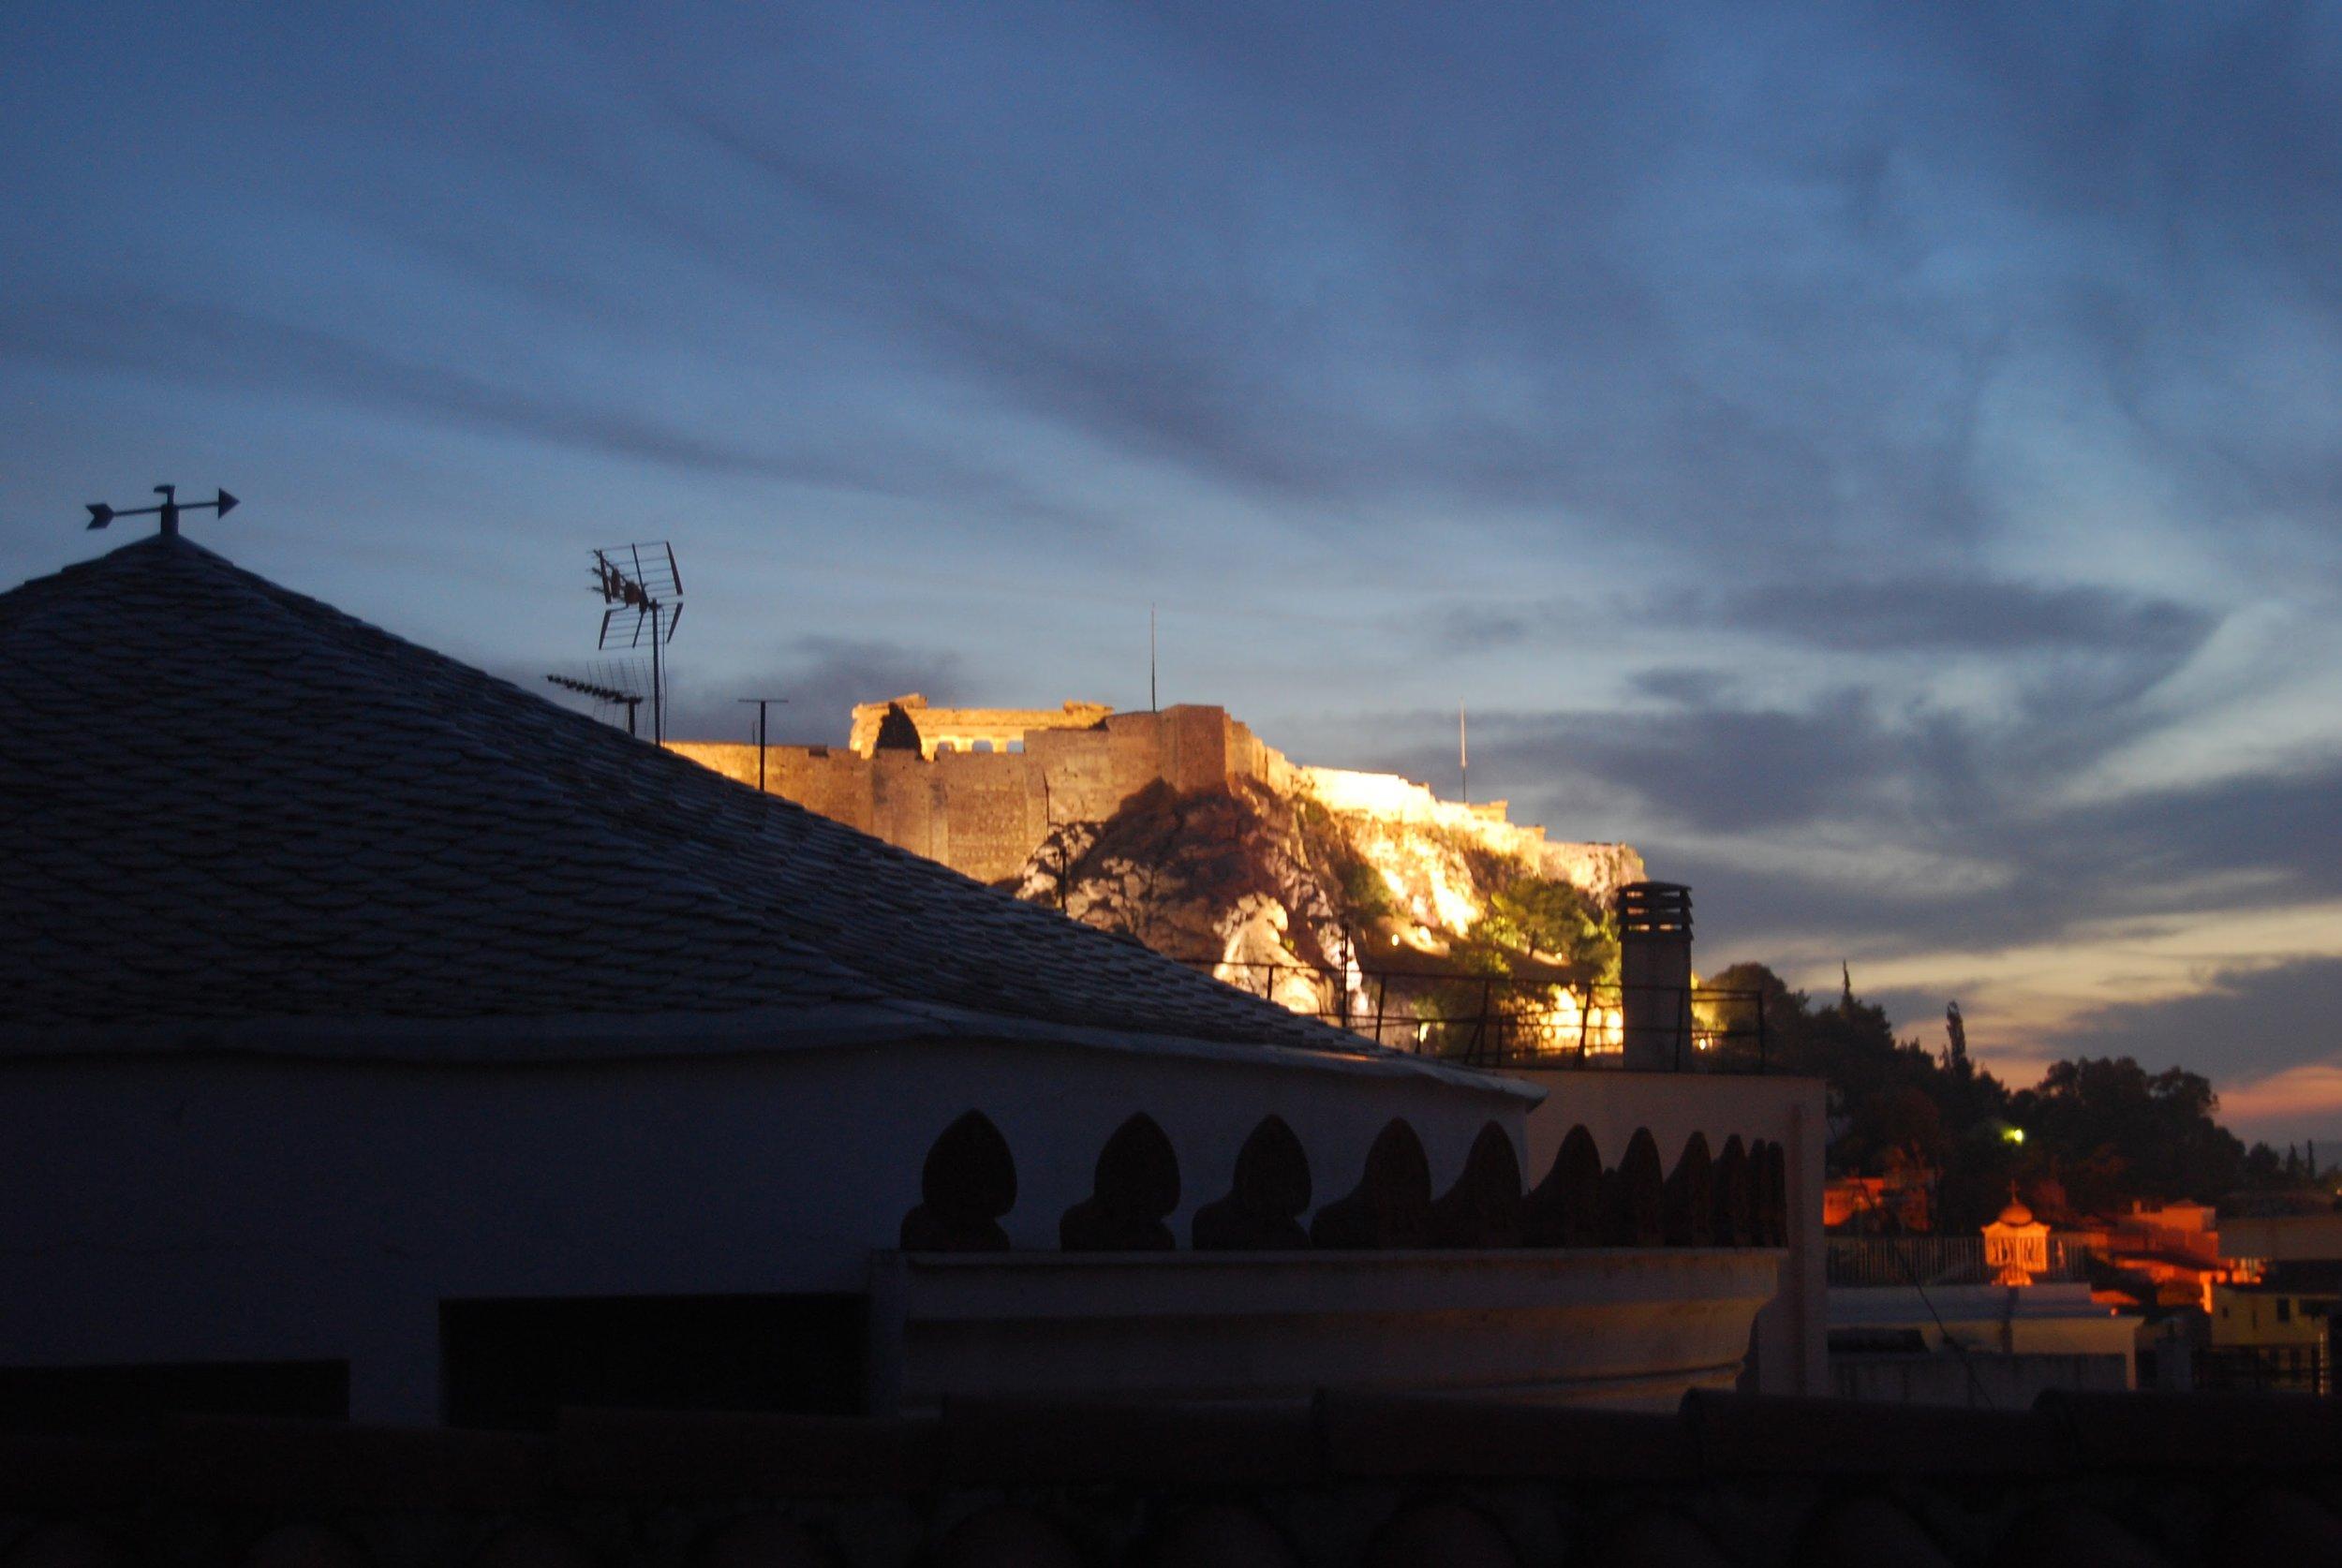 acropolis at night.JPG